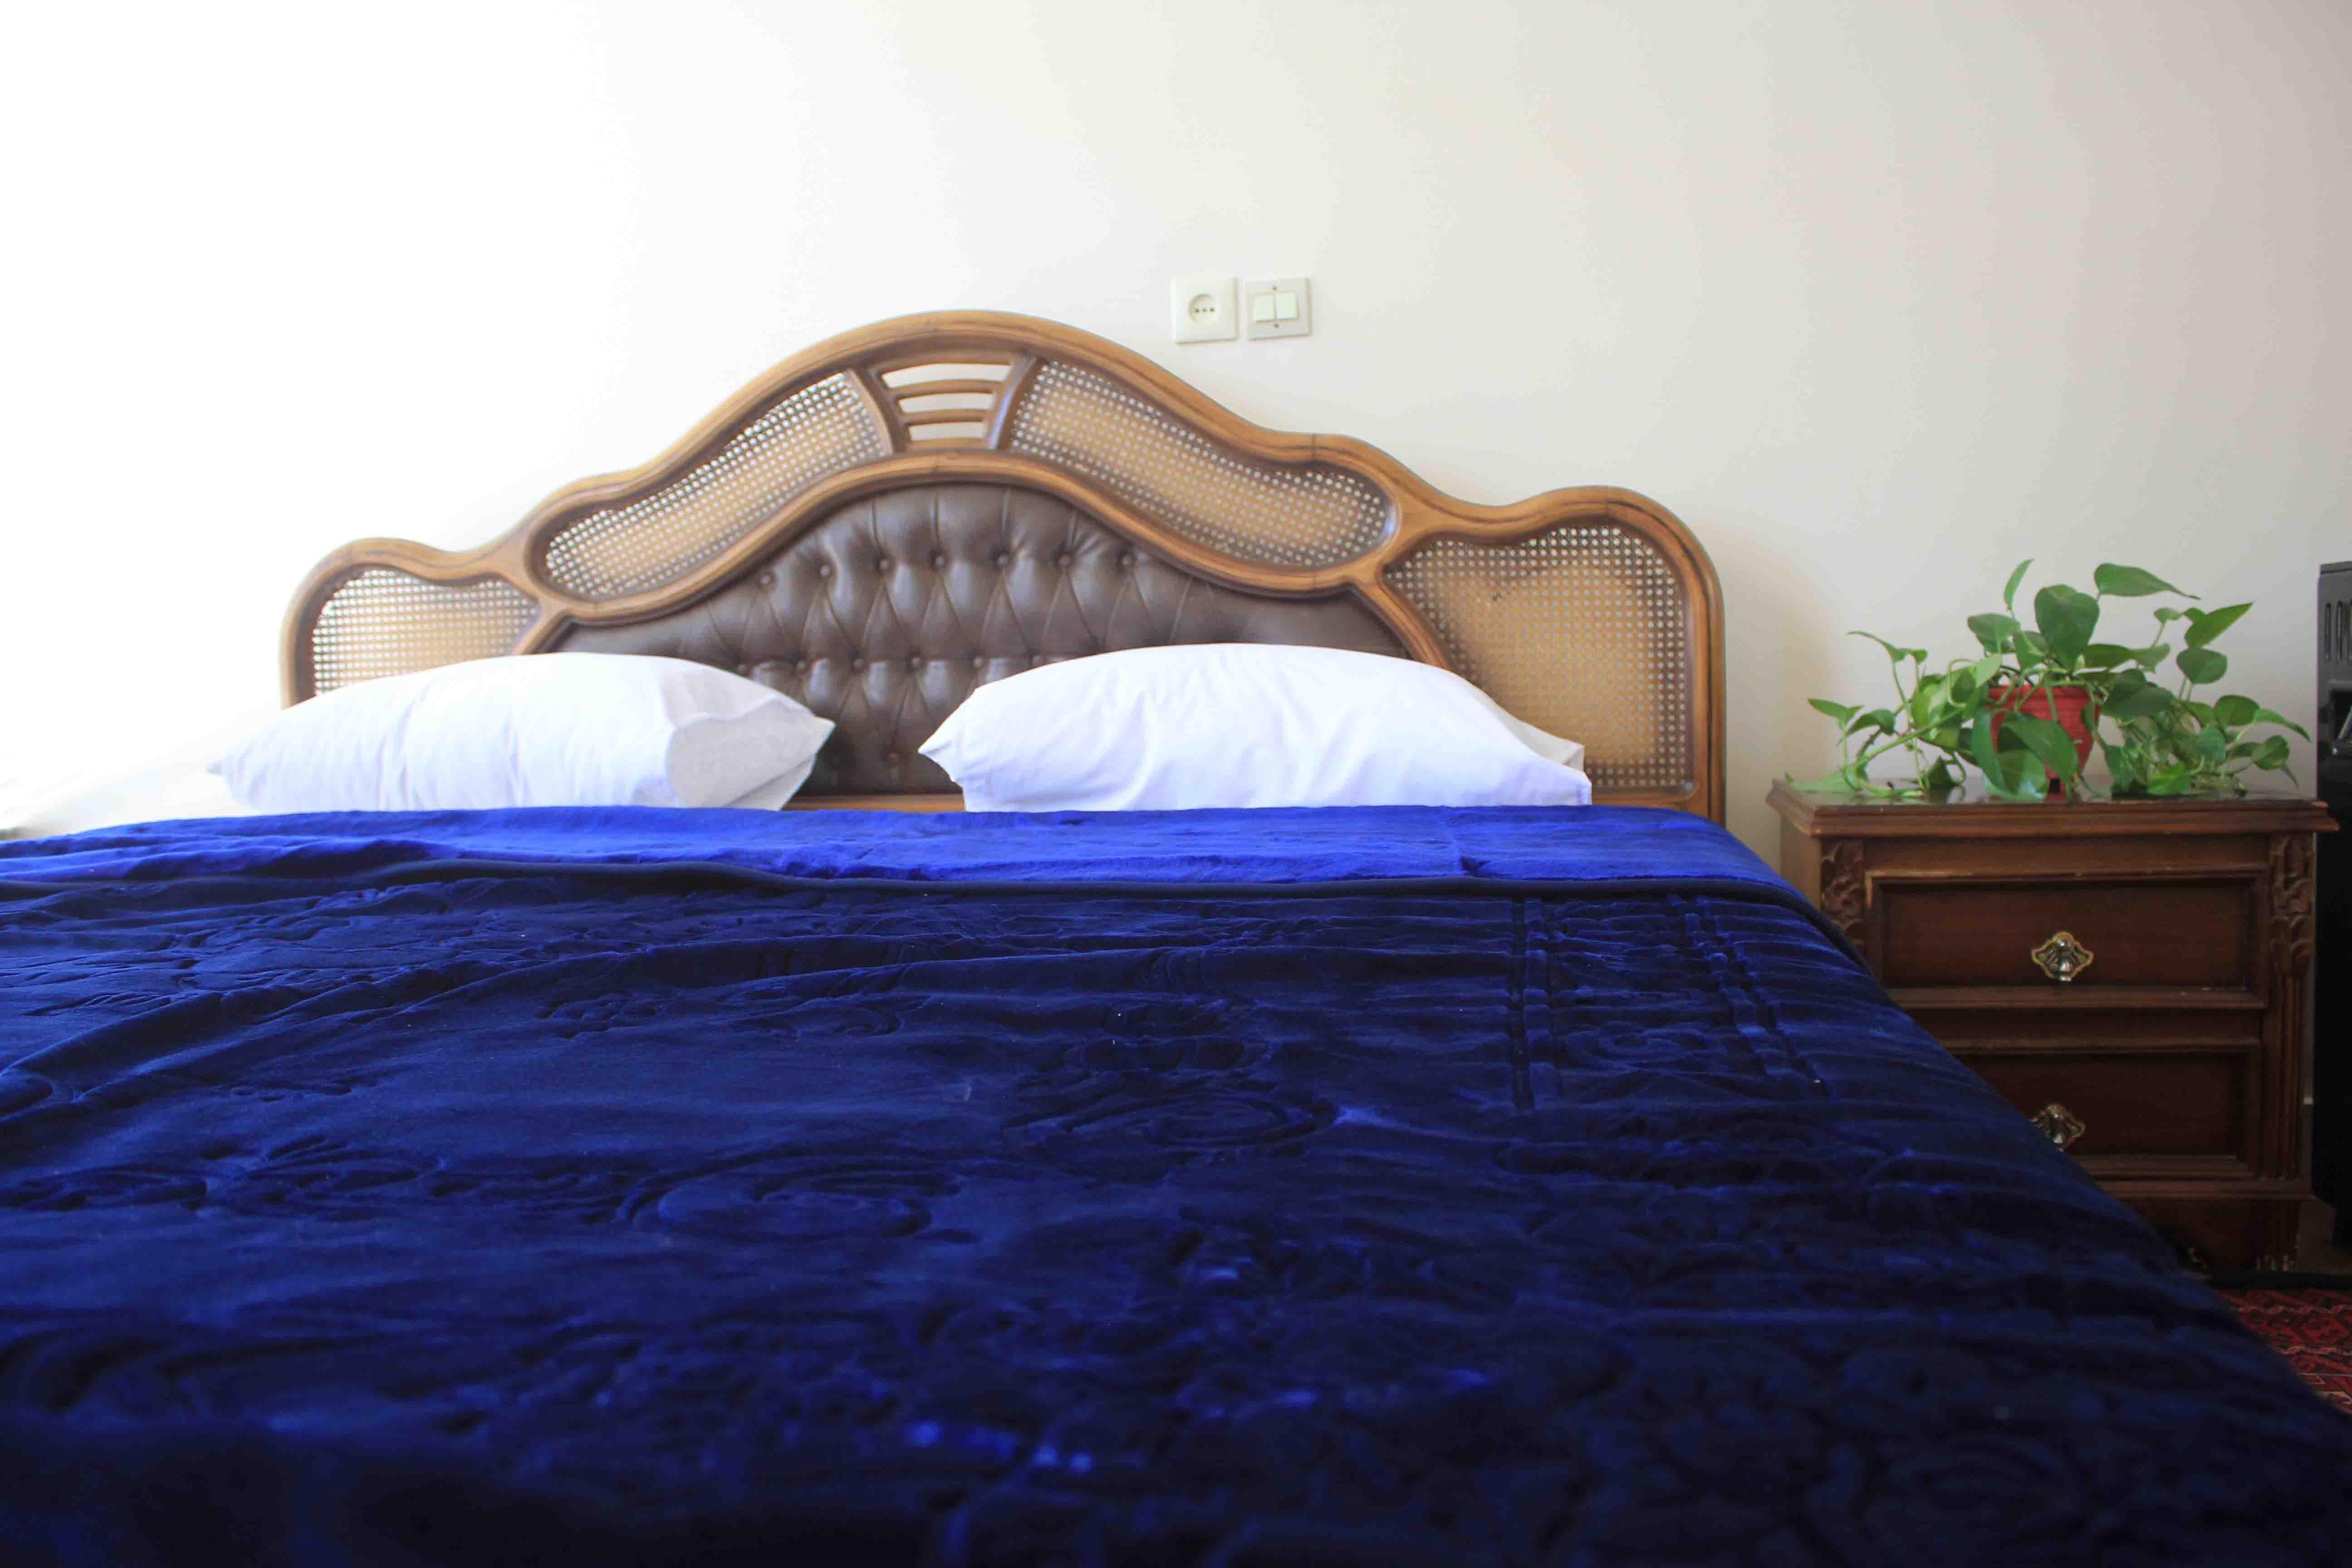 townee آپارتمان مبله در بزرگمهر اصفهان